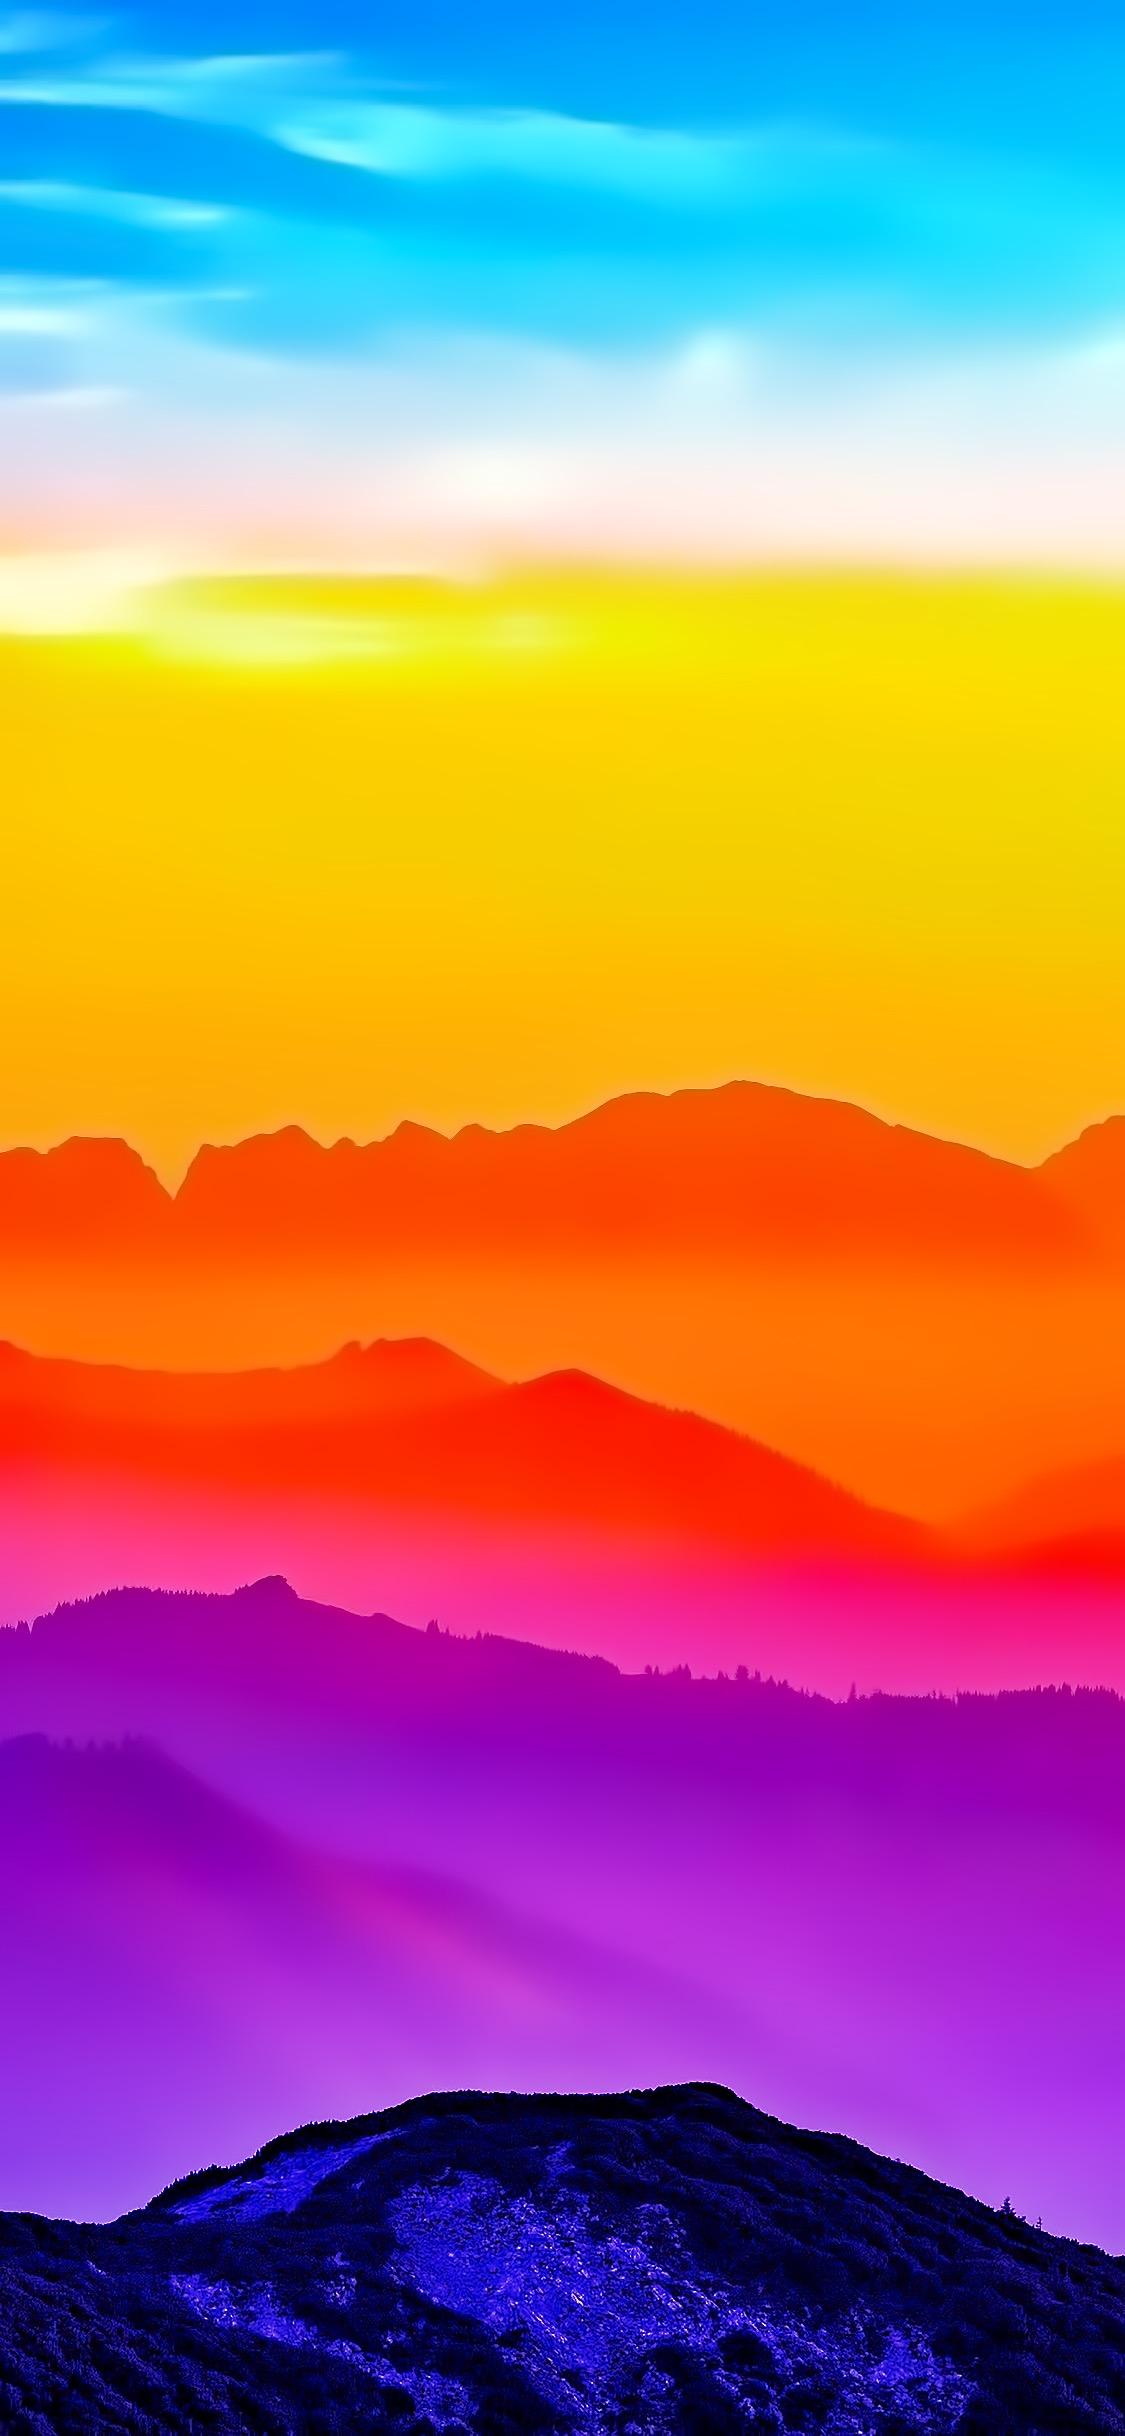 Snow Falling Wallpaper For Ipad Vivid Colors Iphone Wallpaper Pack